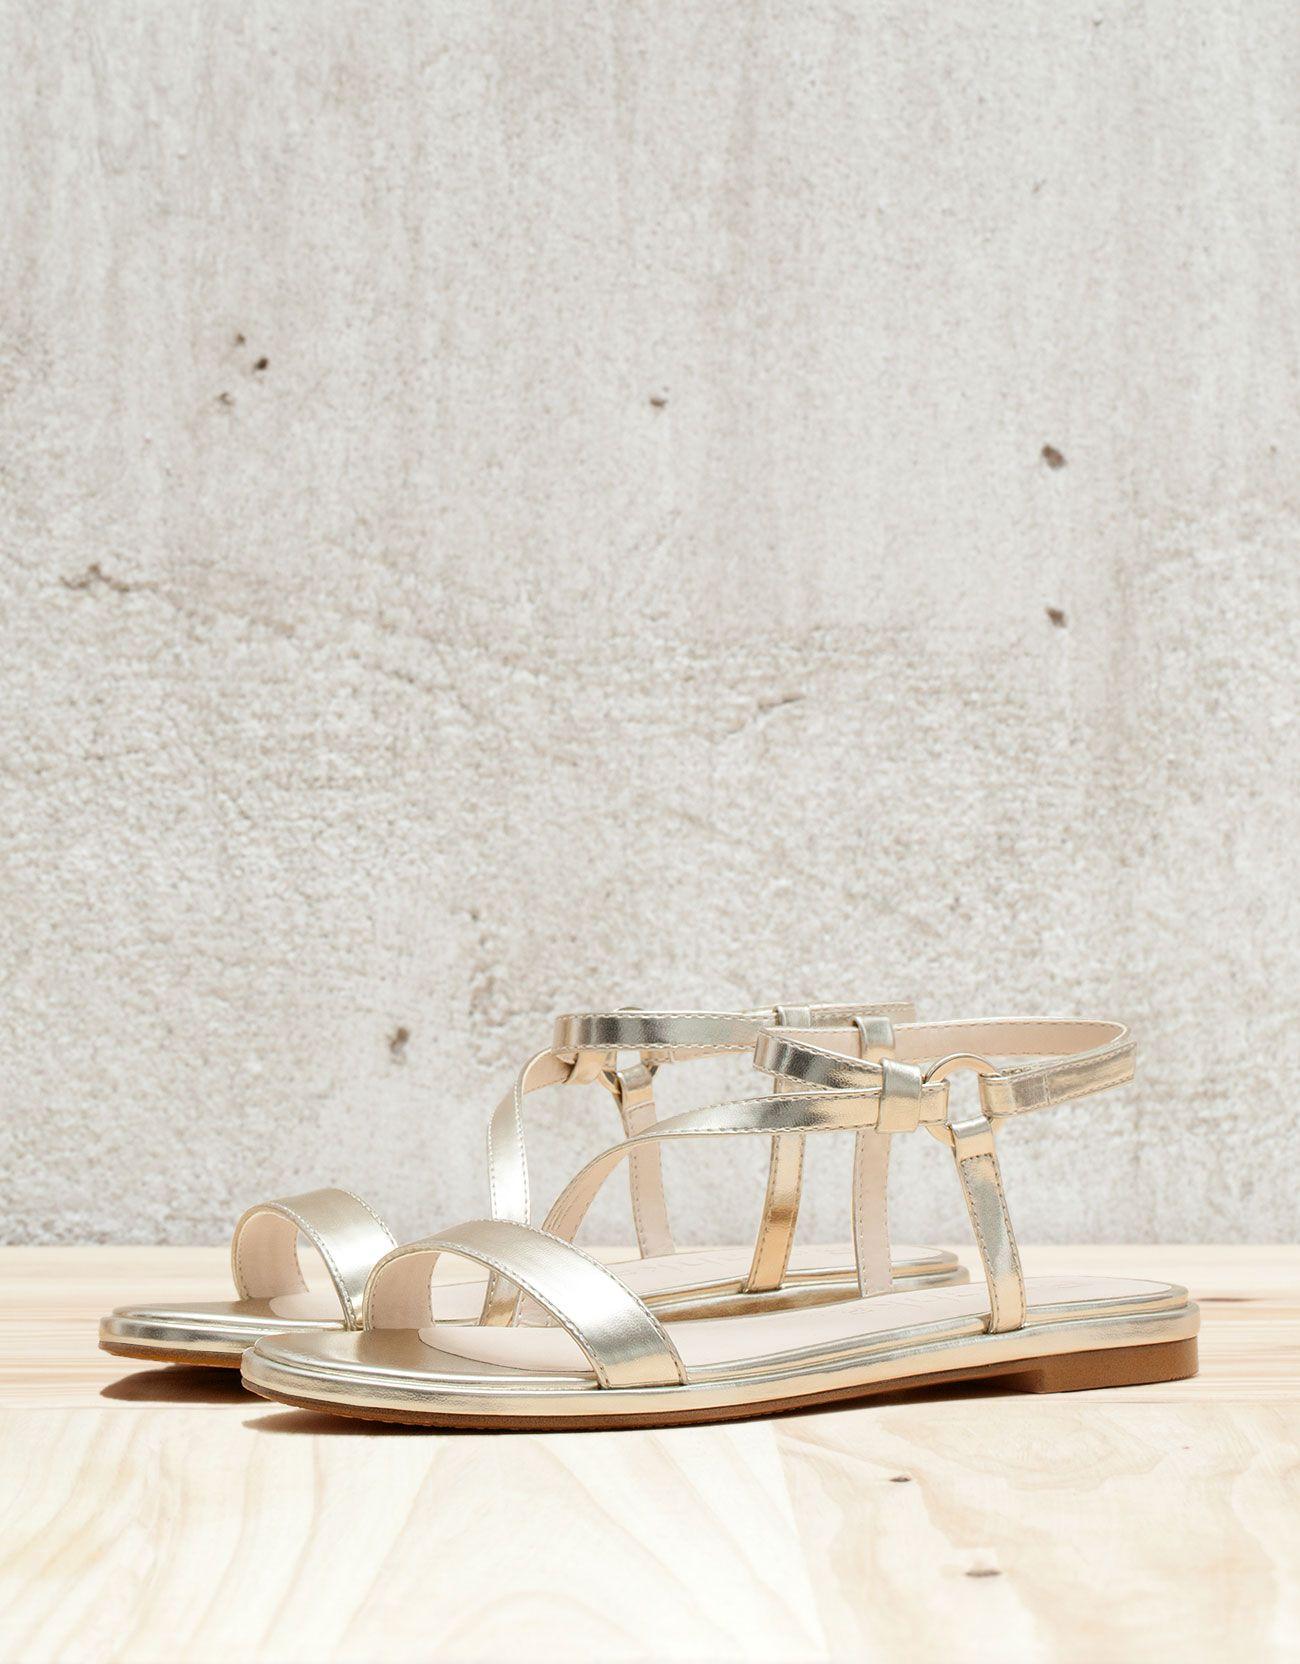 Access Denied Strappy Sandals Flat Flat Sandals Gold Flat Sandals